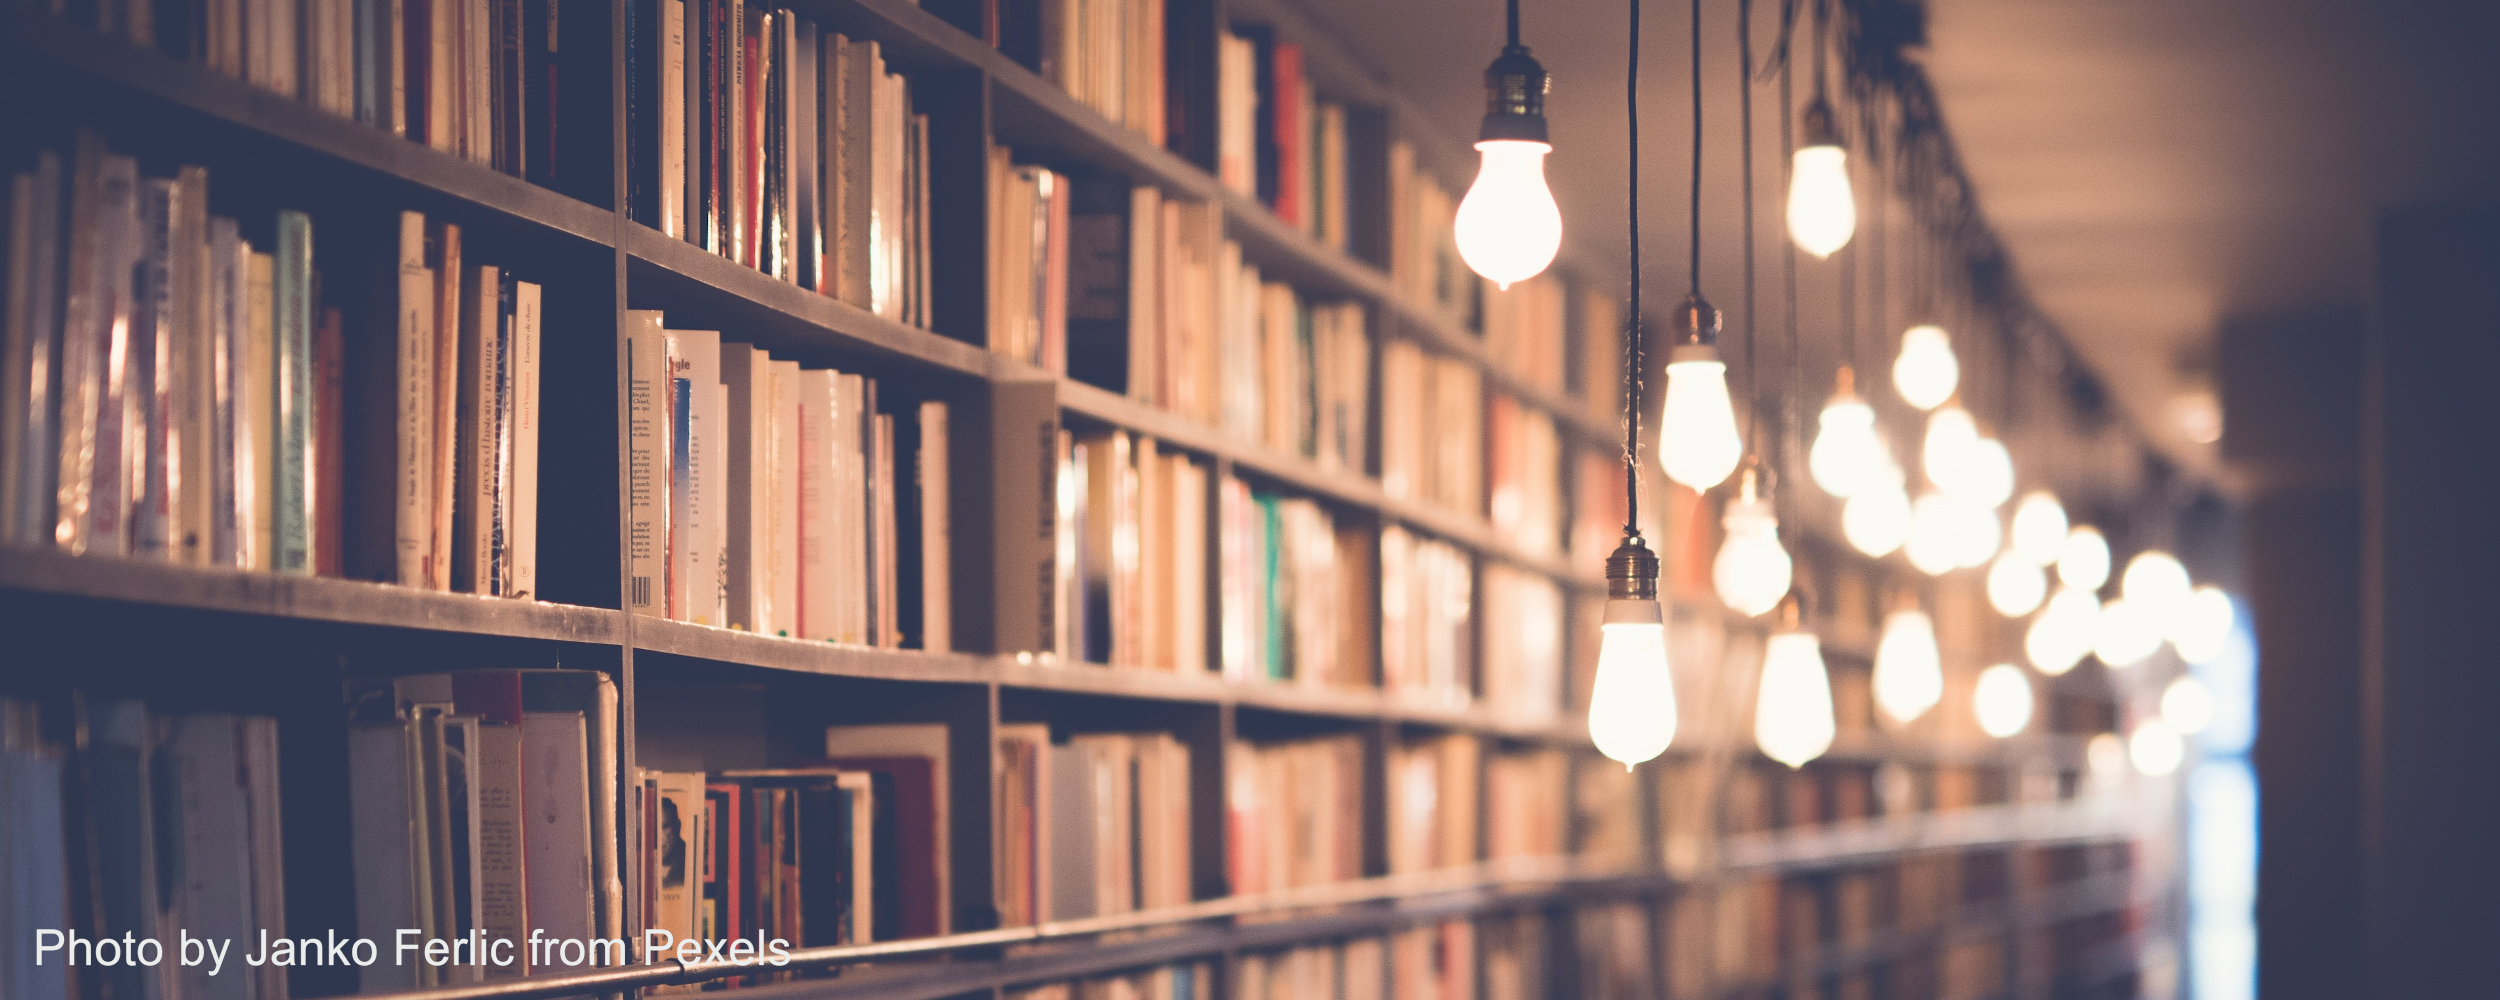 books-library-research-lights-lessons-school-ukulele-ronan-mccauley-music-teacher-guitar-flute-recorder-leaving-junior-cert-grinds-theory-arklow-wicklow-dublin-leinster-irelandpng